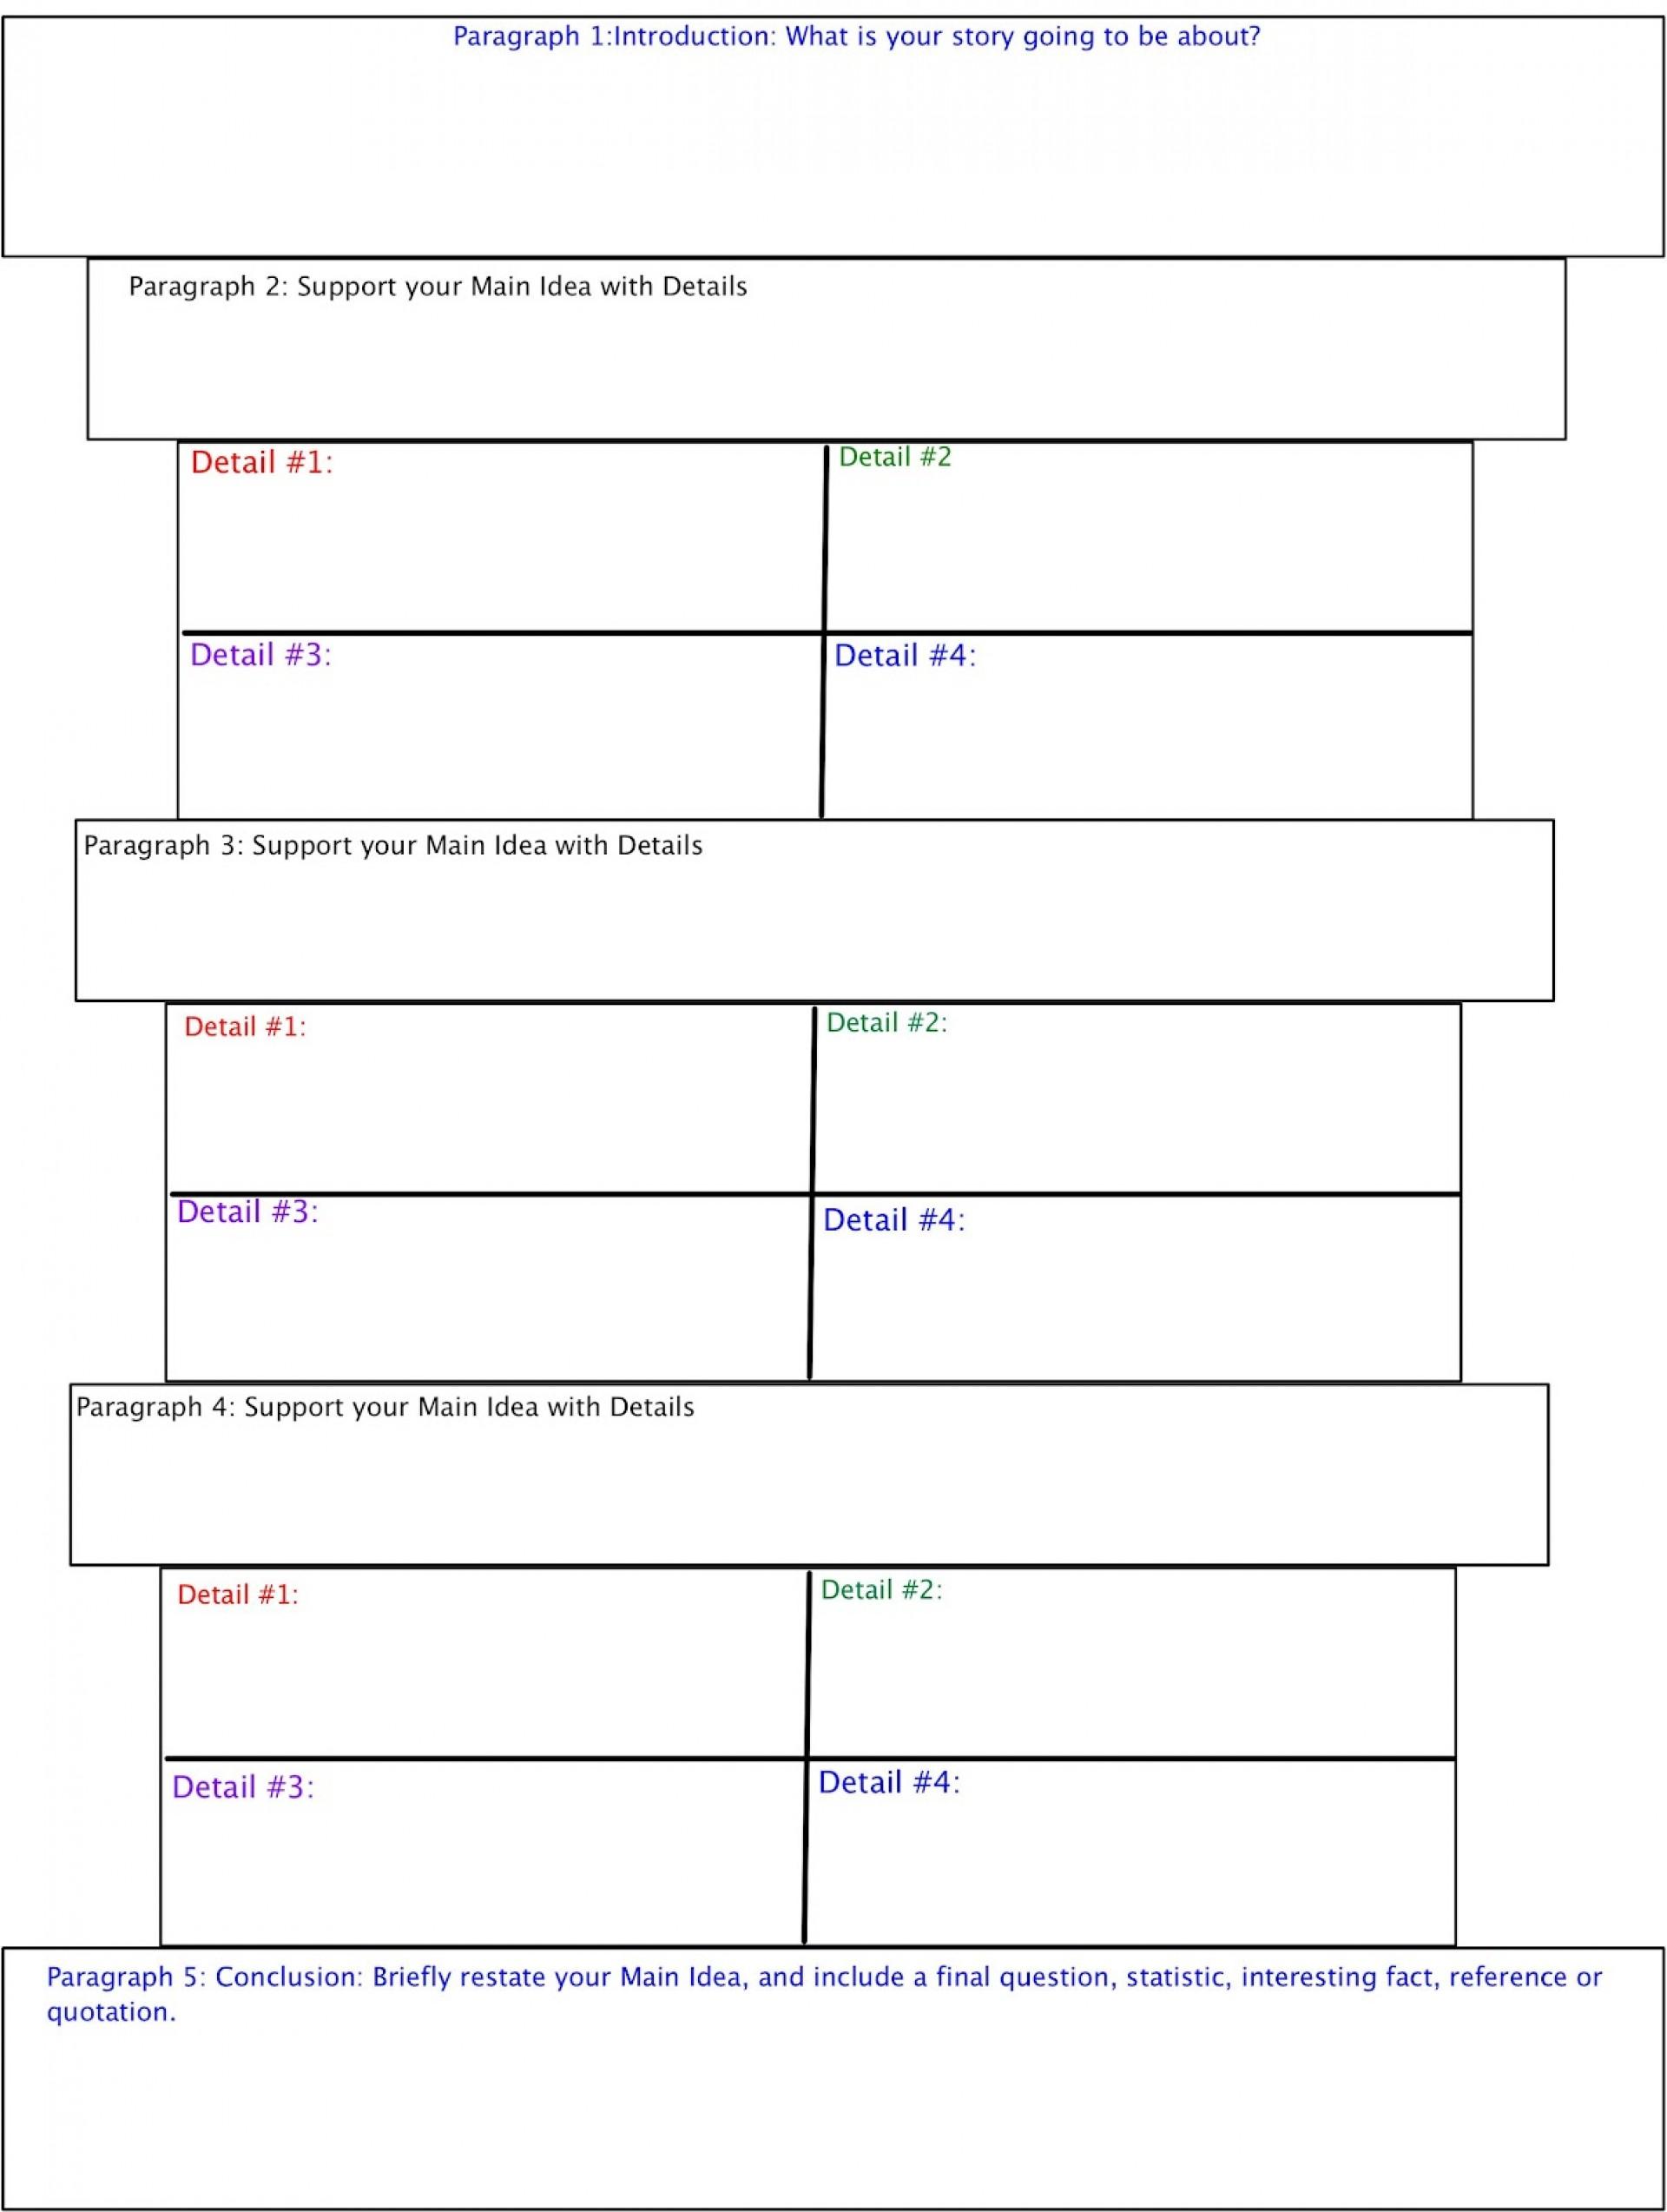 017 Essay Example Five20paragraph20graphic20organizer20blank Graphic Incredible Organizer Narrative Pdf Persuasive Middle School Literary 5th Grade 1920